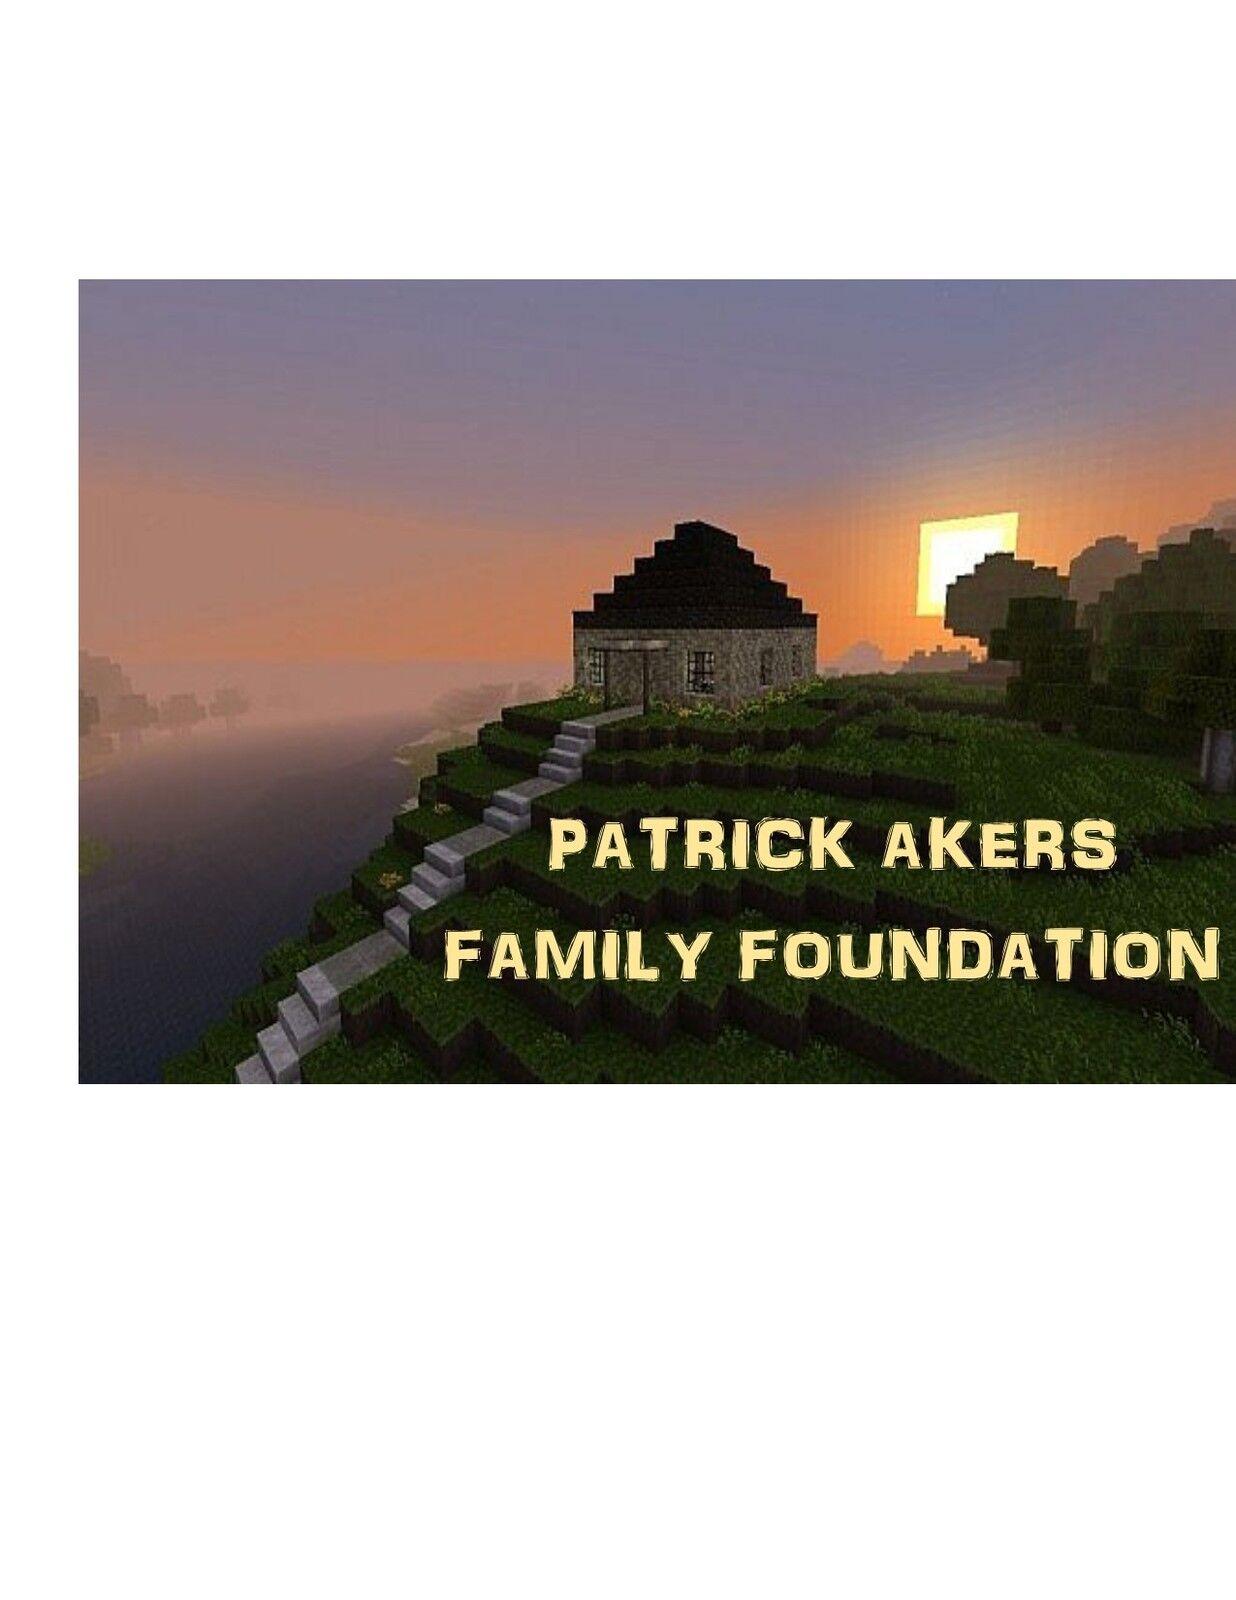 Patrick Akers Family Foundation